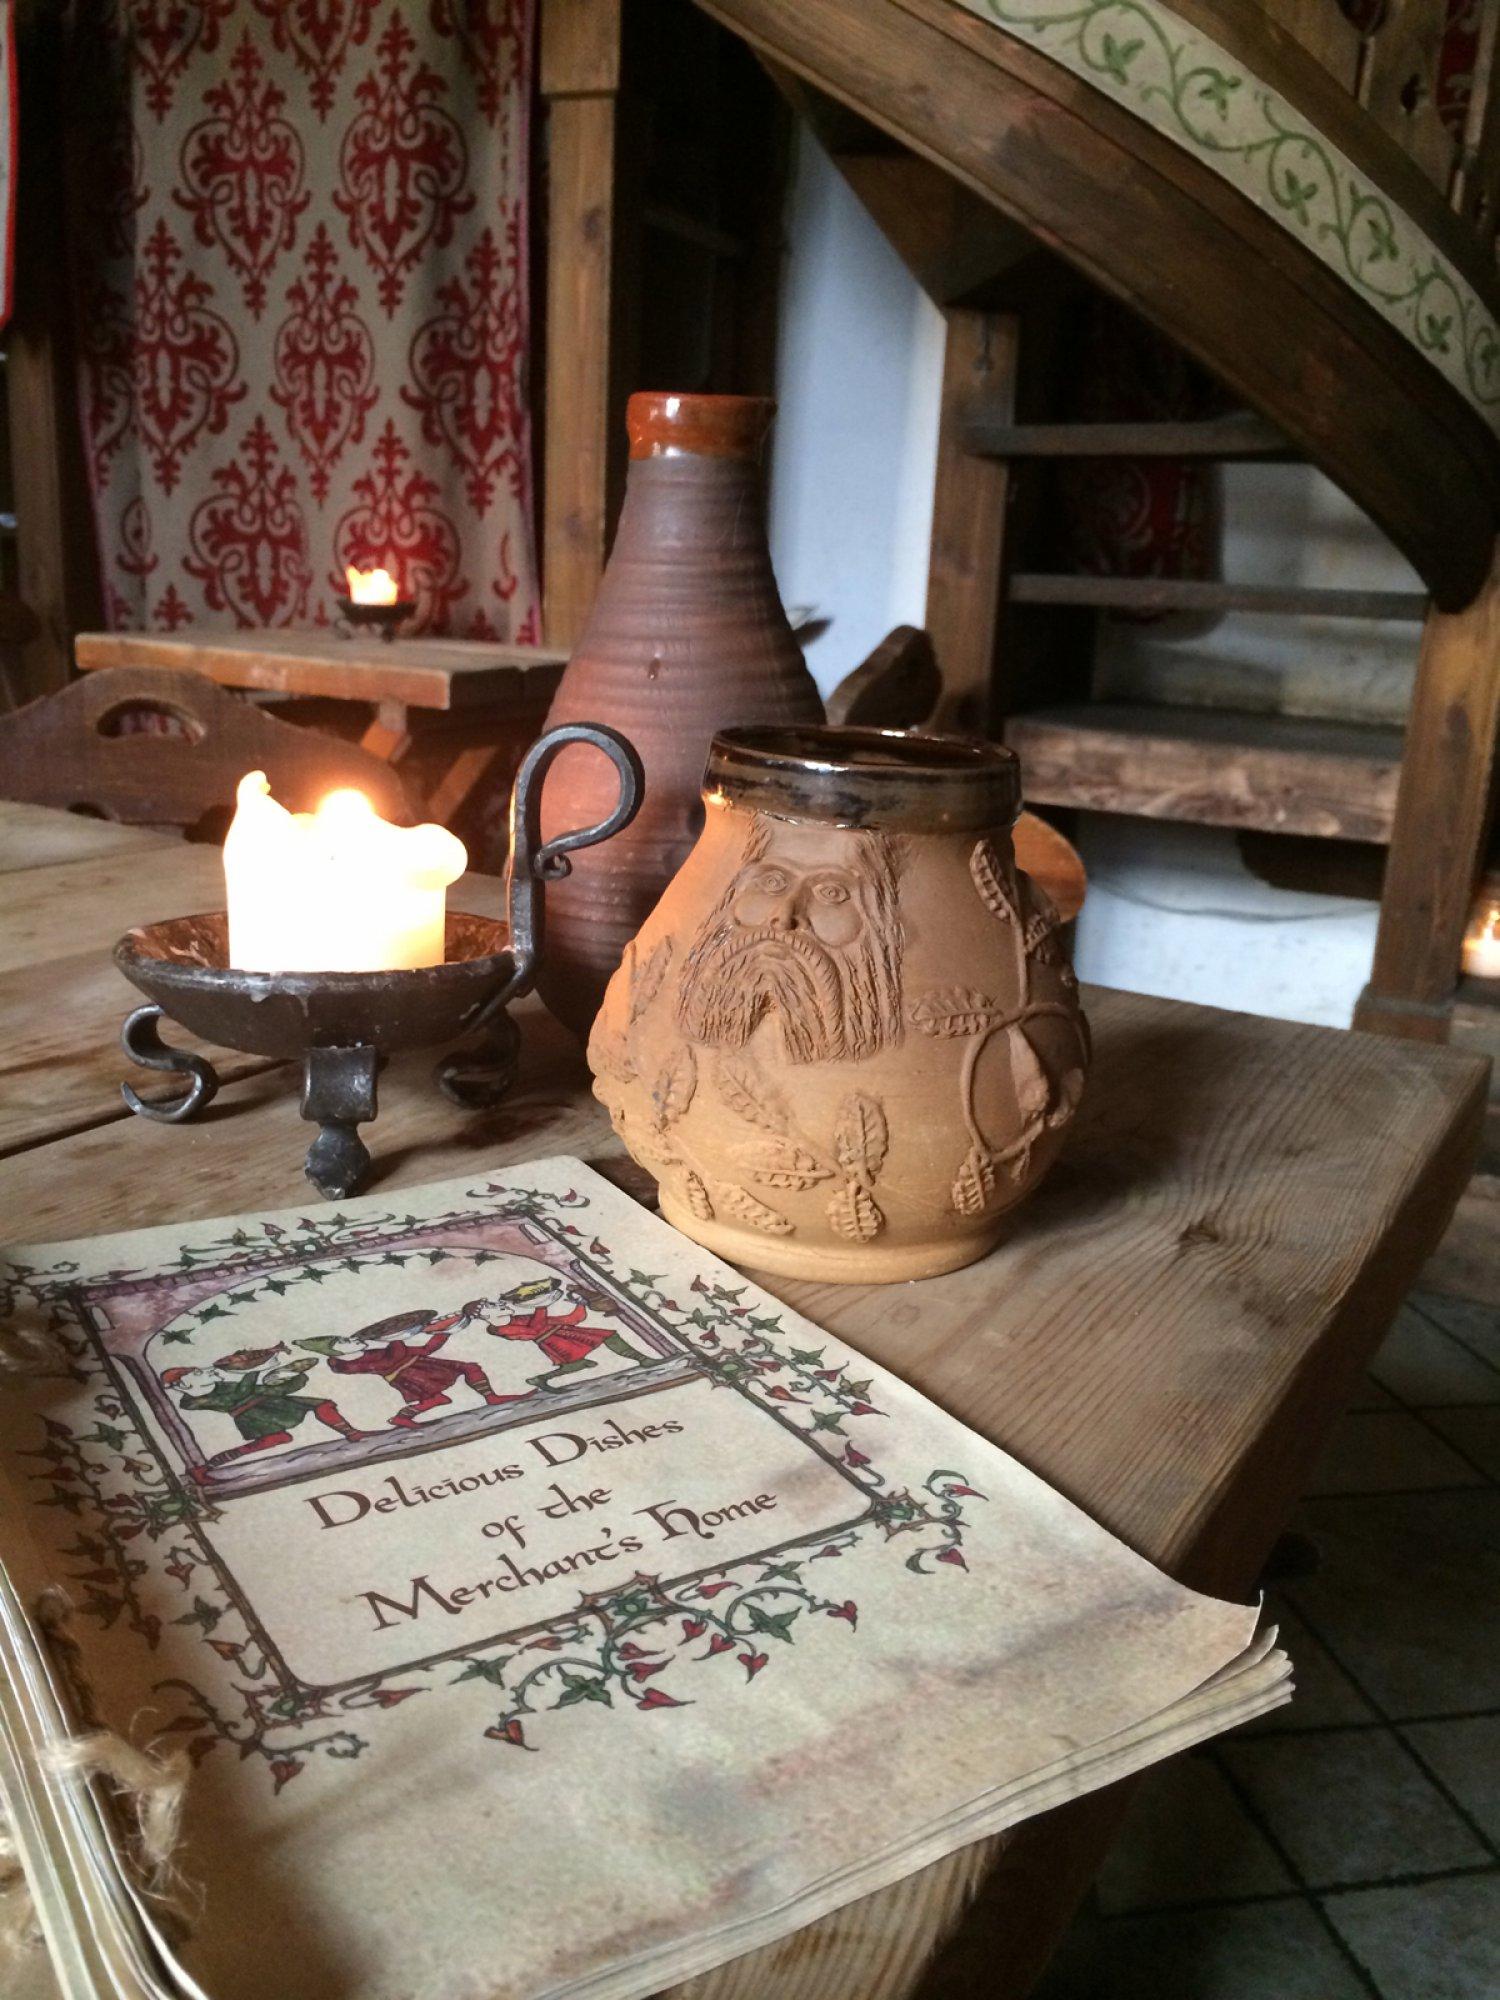 https://bubo.sk/uploads/galleries/7342/estonsko-chute-stredoveku-v-olde-hansa-restauracii-tallinn.jpg